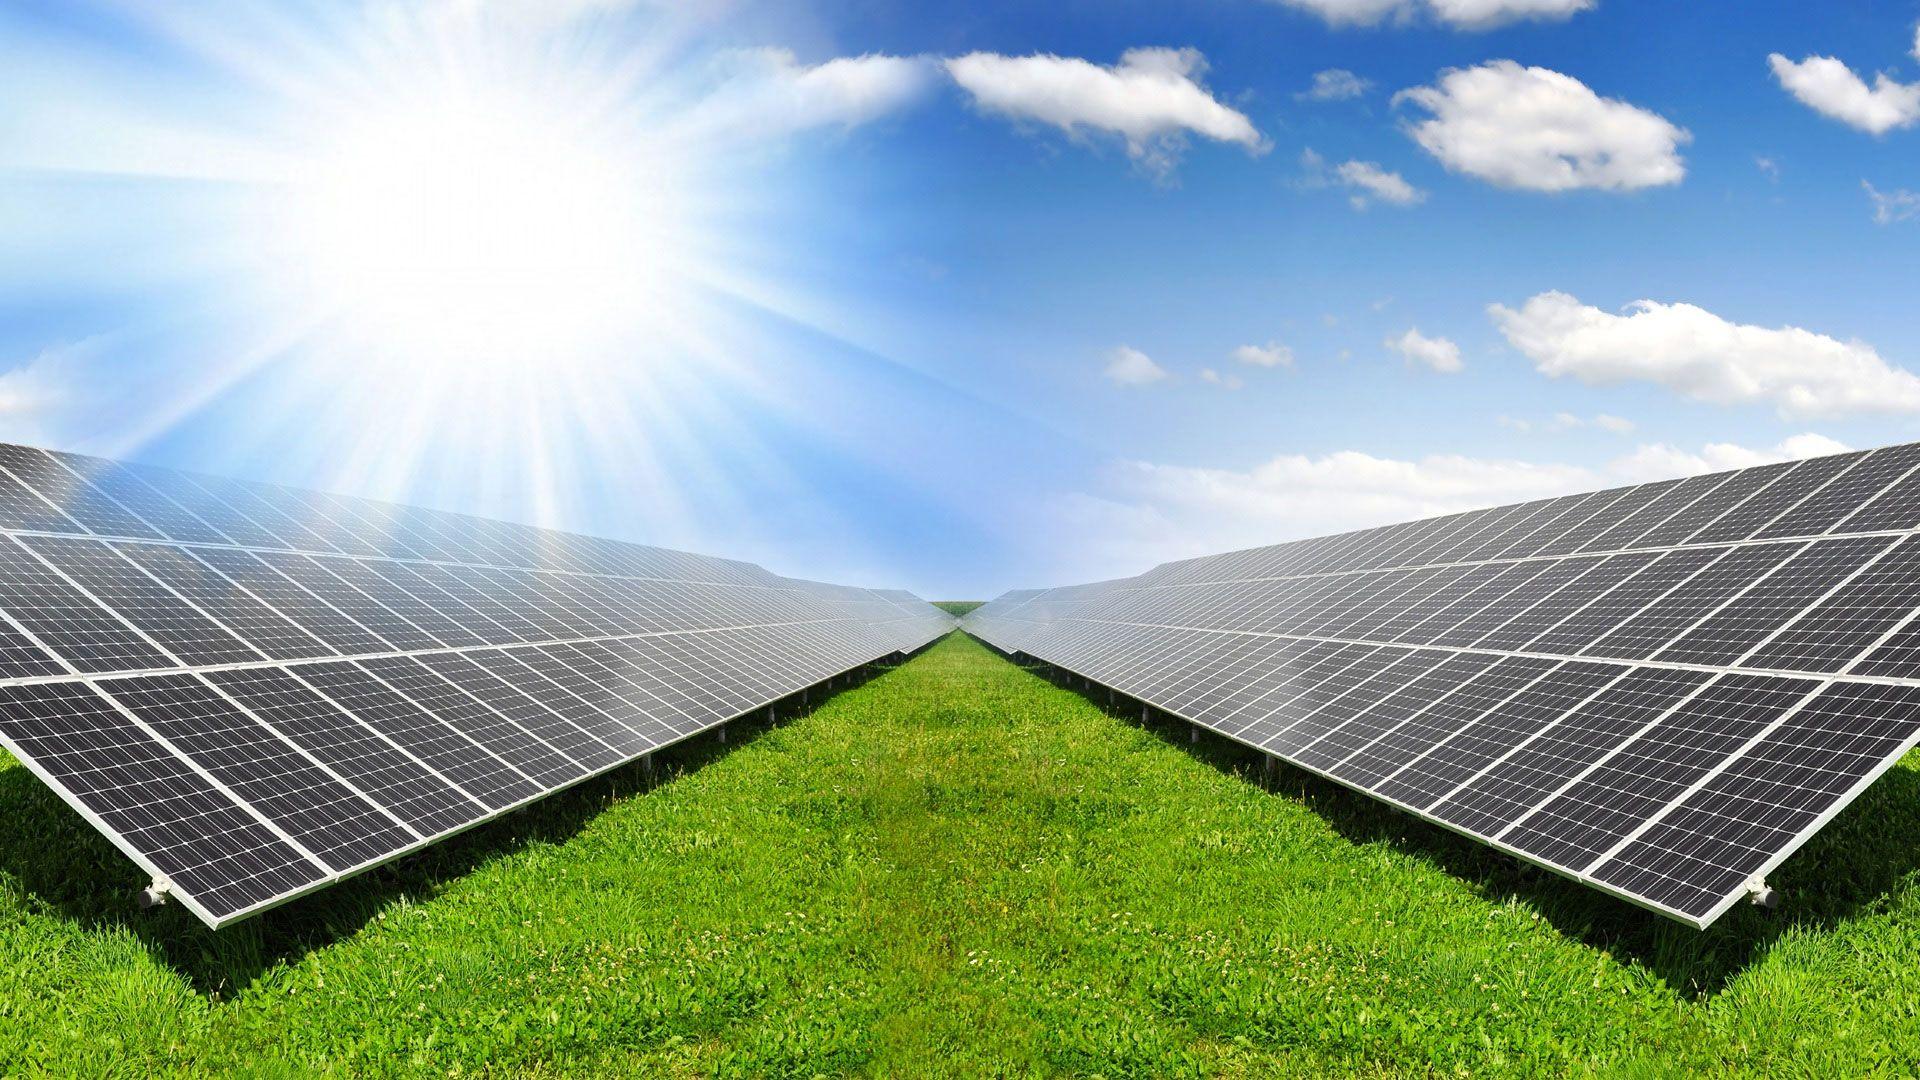 Iso Integrated Solar Operations Energia Renovable San Juan Puerto Rico Energia Renovable Puerto Rico Energia Solar